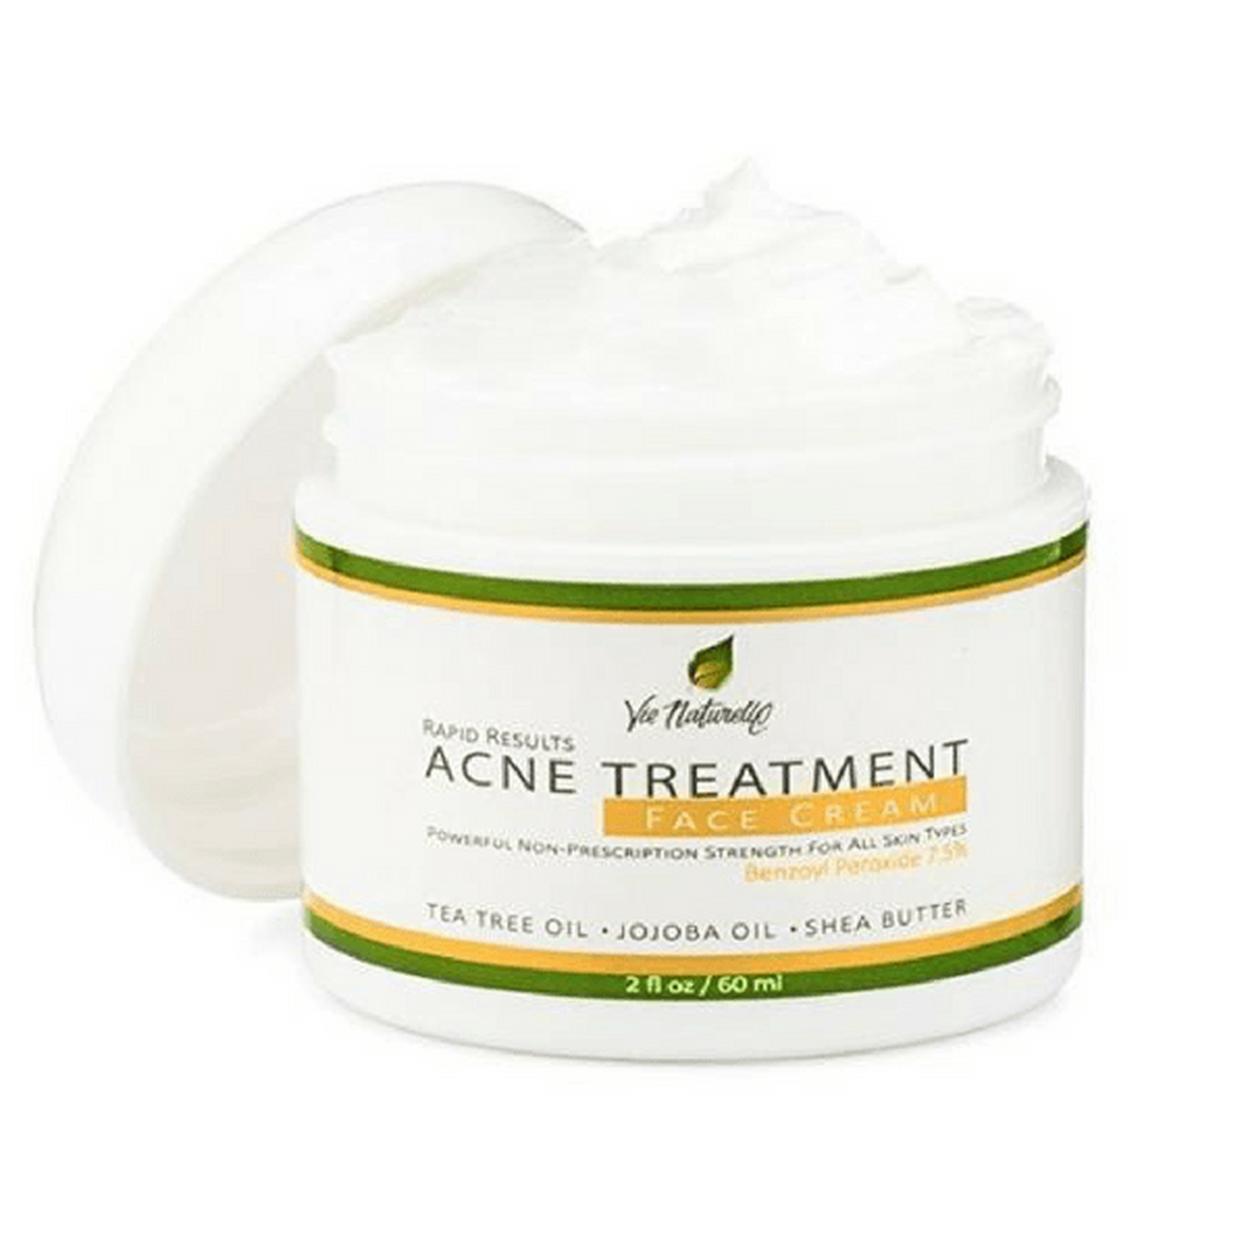 Acne Treatment Cream (2 oz Jar) 58f7956bc98fc462b430ea42